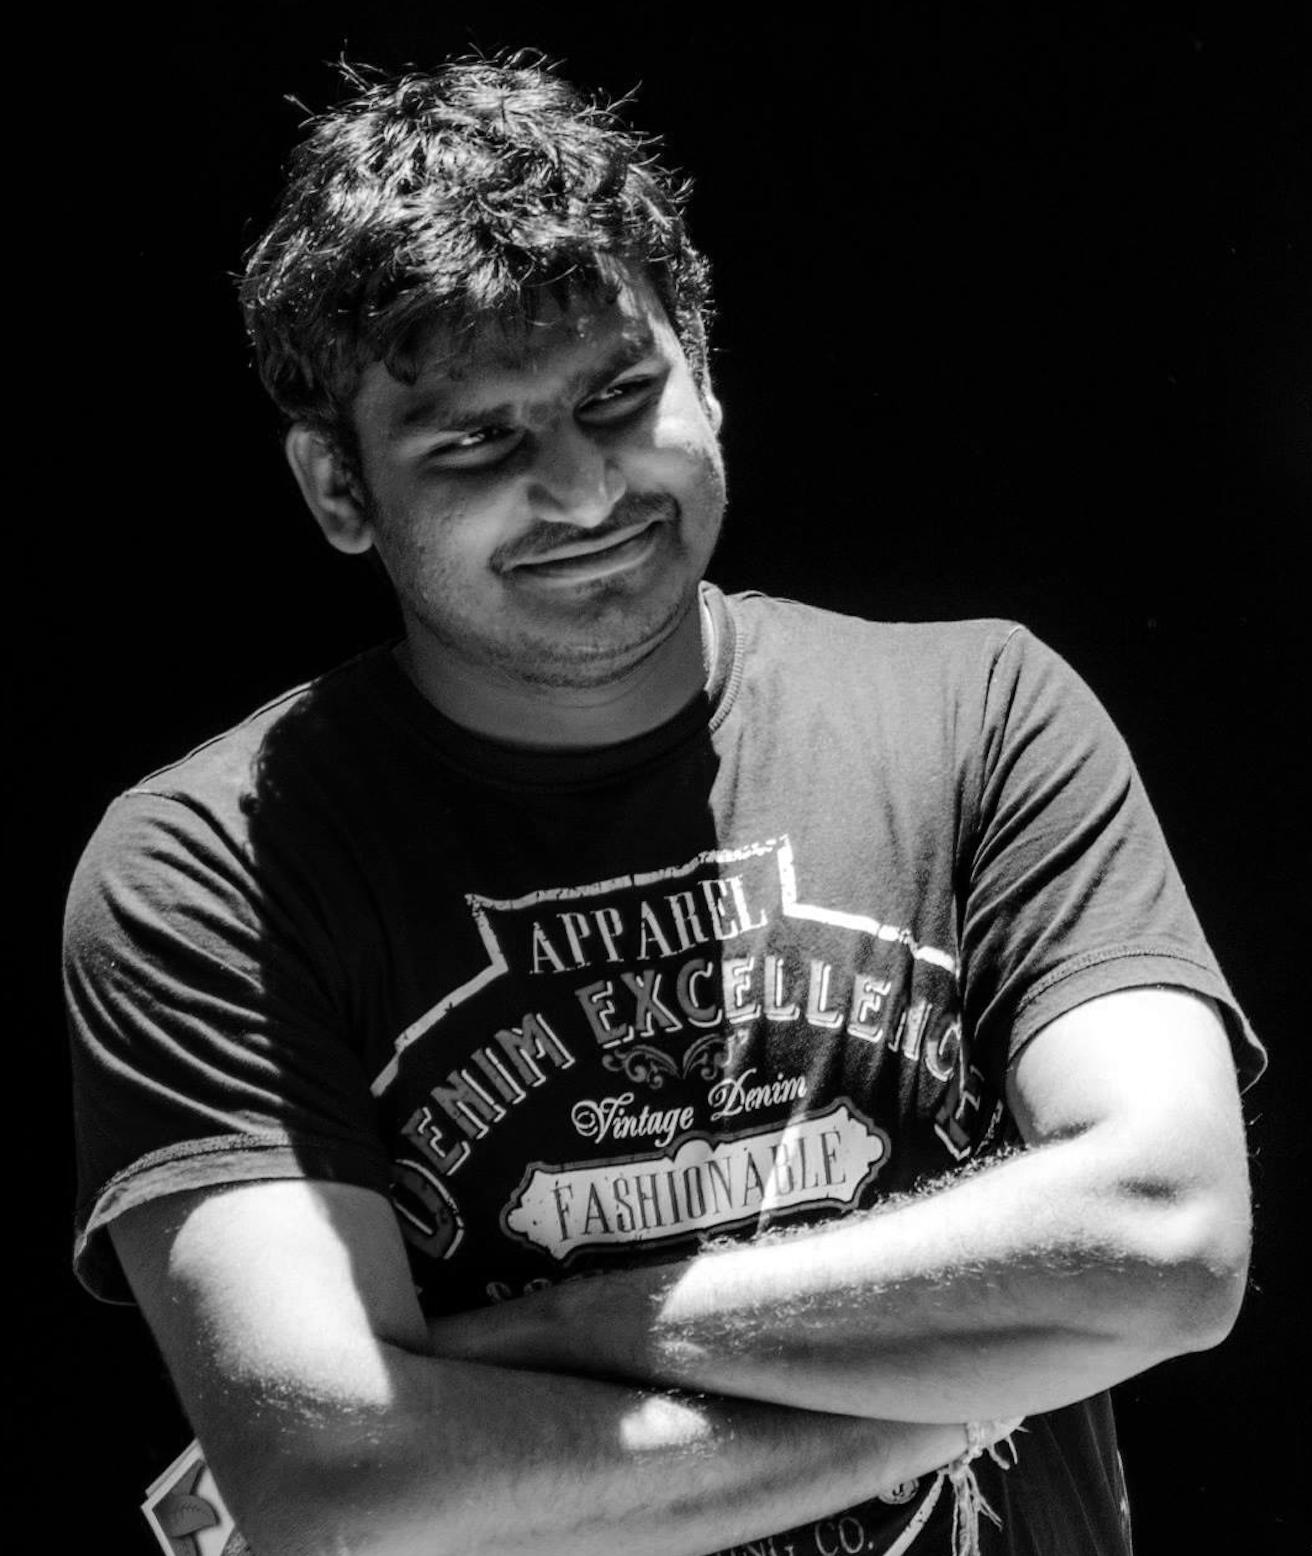 Pradeep_Nethagani-2